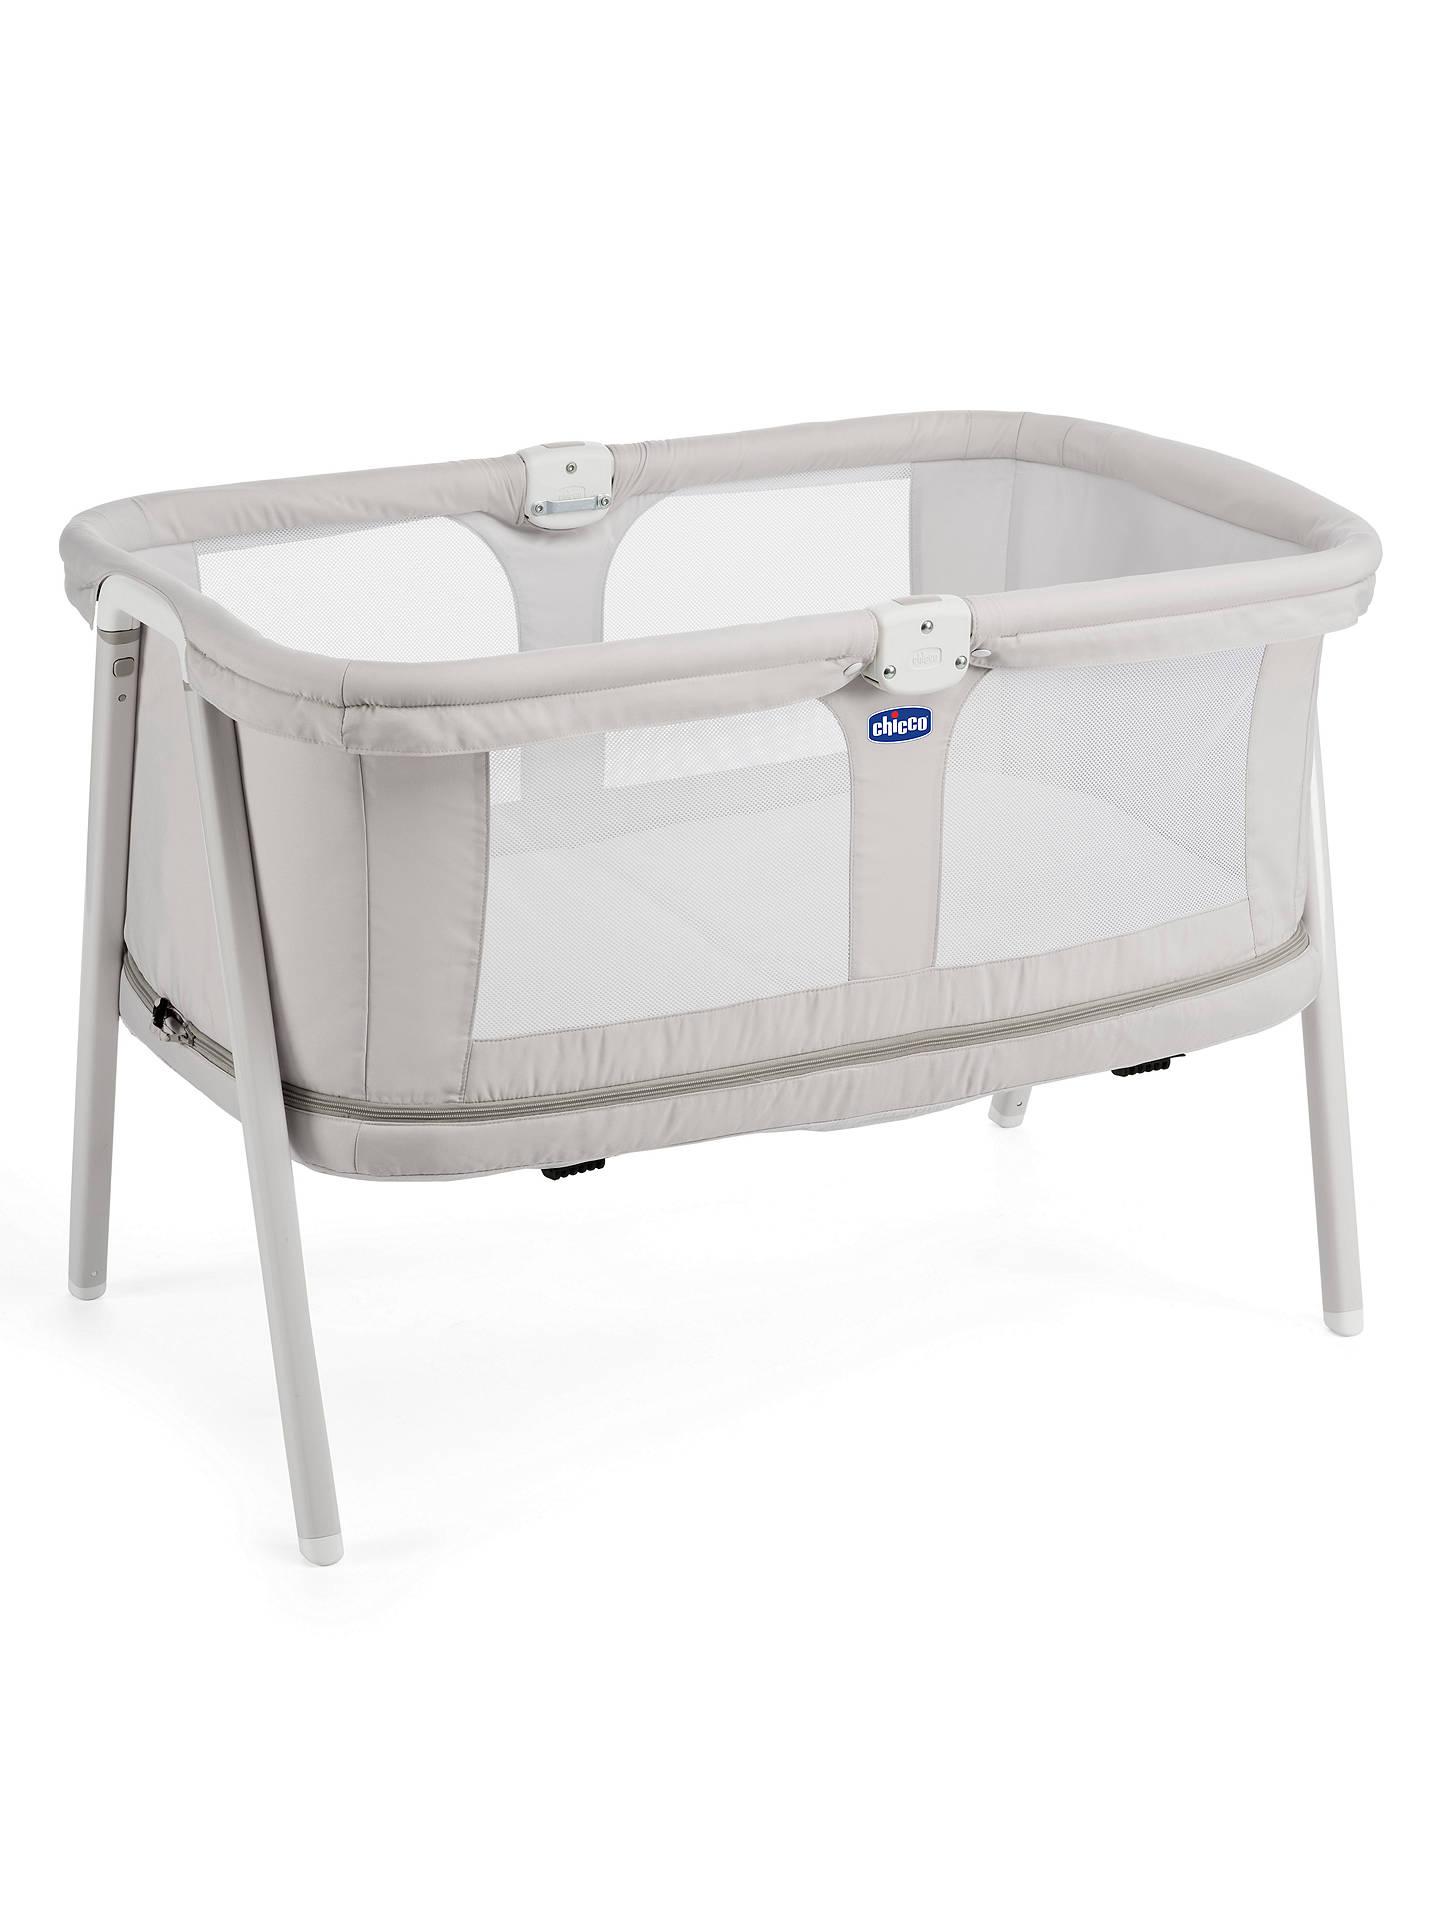 Chicco Lullago Zip Travel Crib Grey At John Lewis Partners